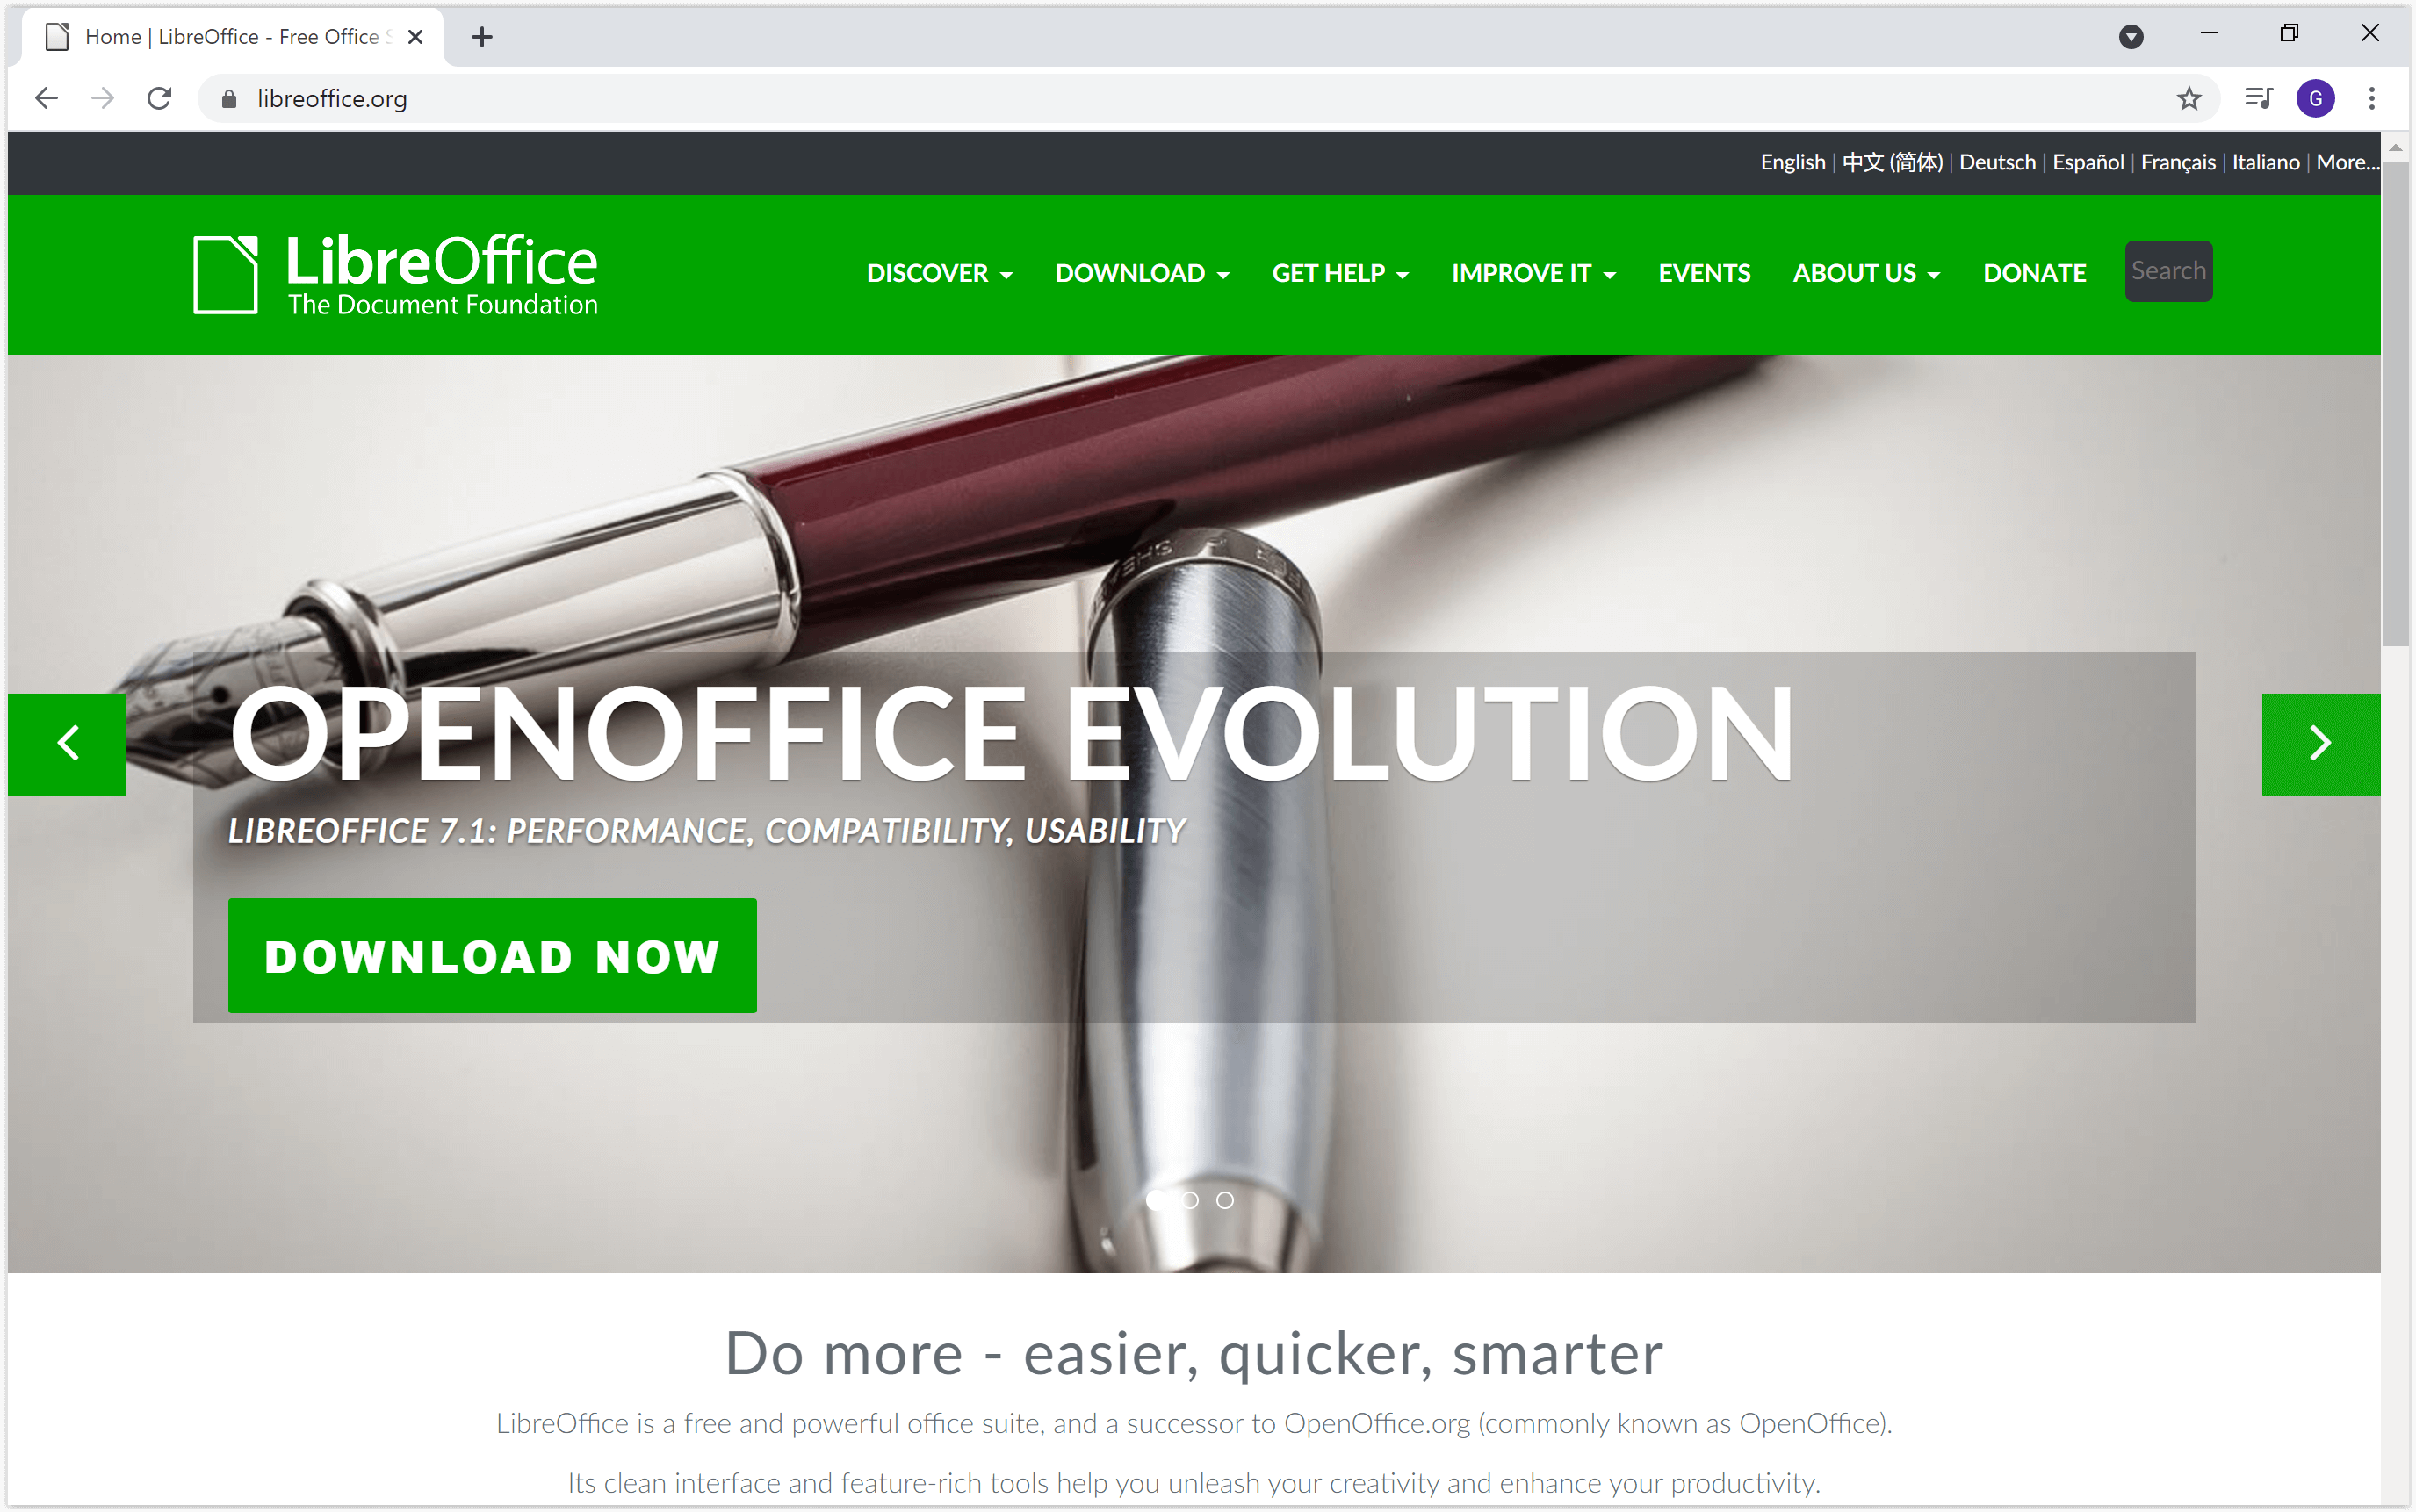 LibreOffice website